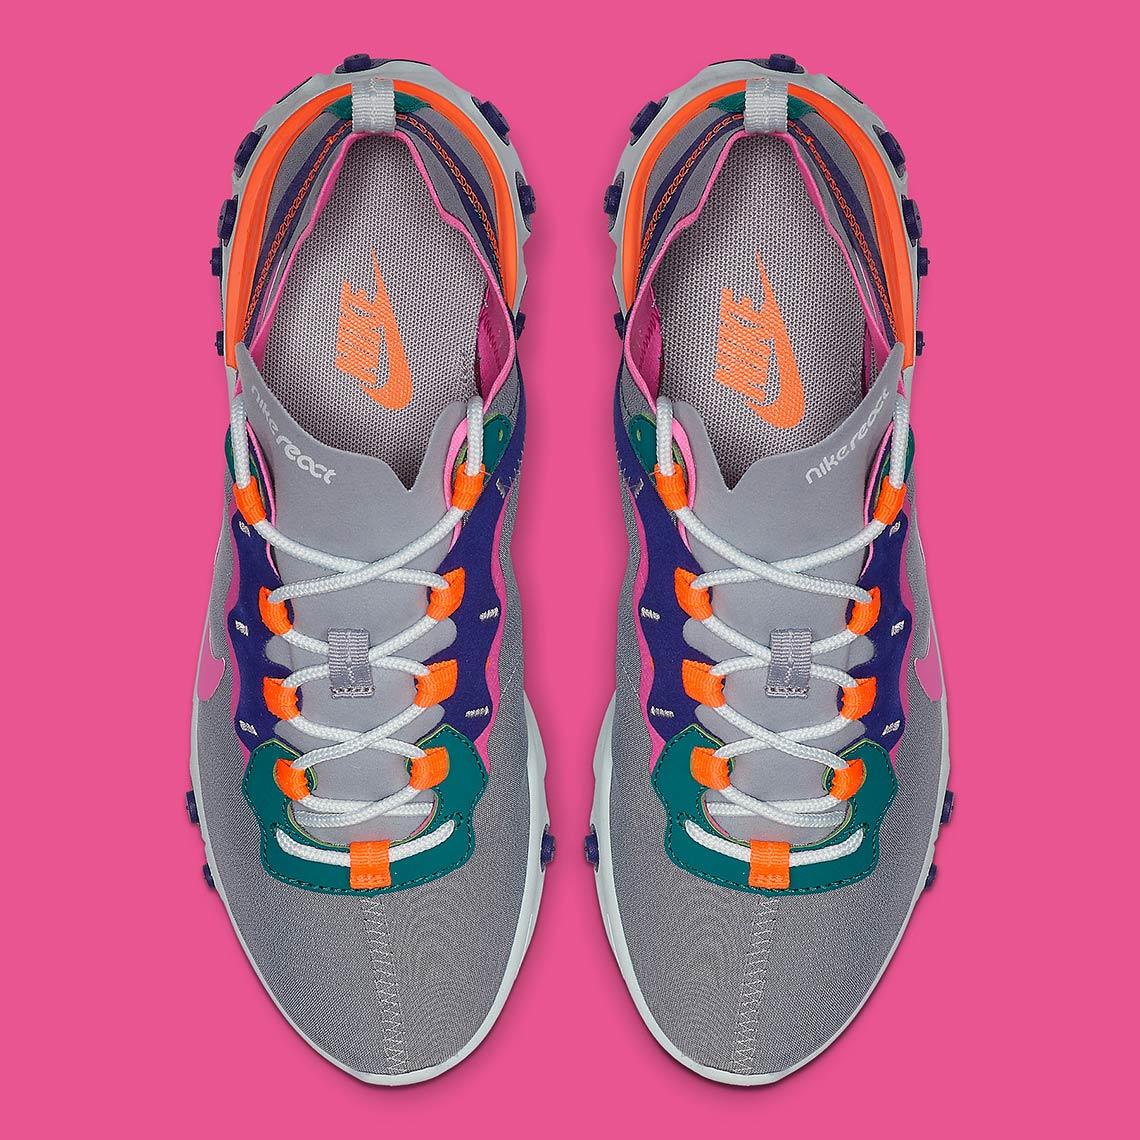 d01dceb74 Nike React Element 55 Wmns  130. Color  Wolf Grey Laser Fuchsia-Hyper  Crimson Style Code  BQ2728-006. Advertisement. Advertisement